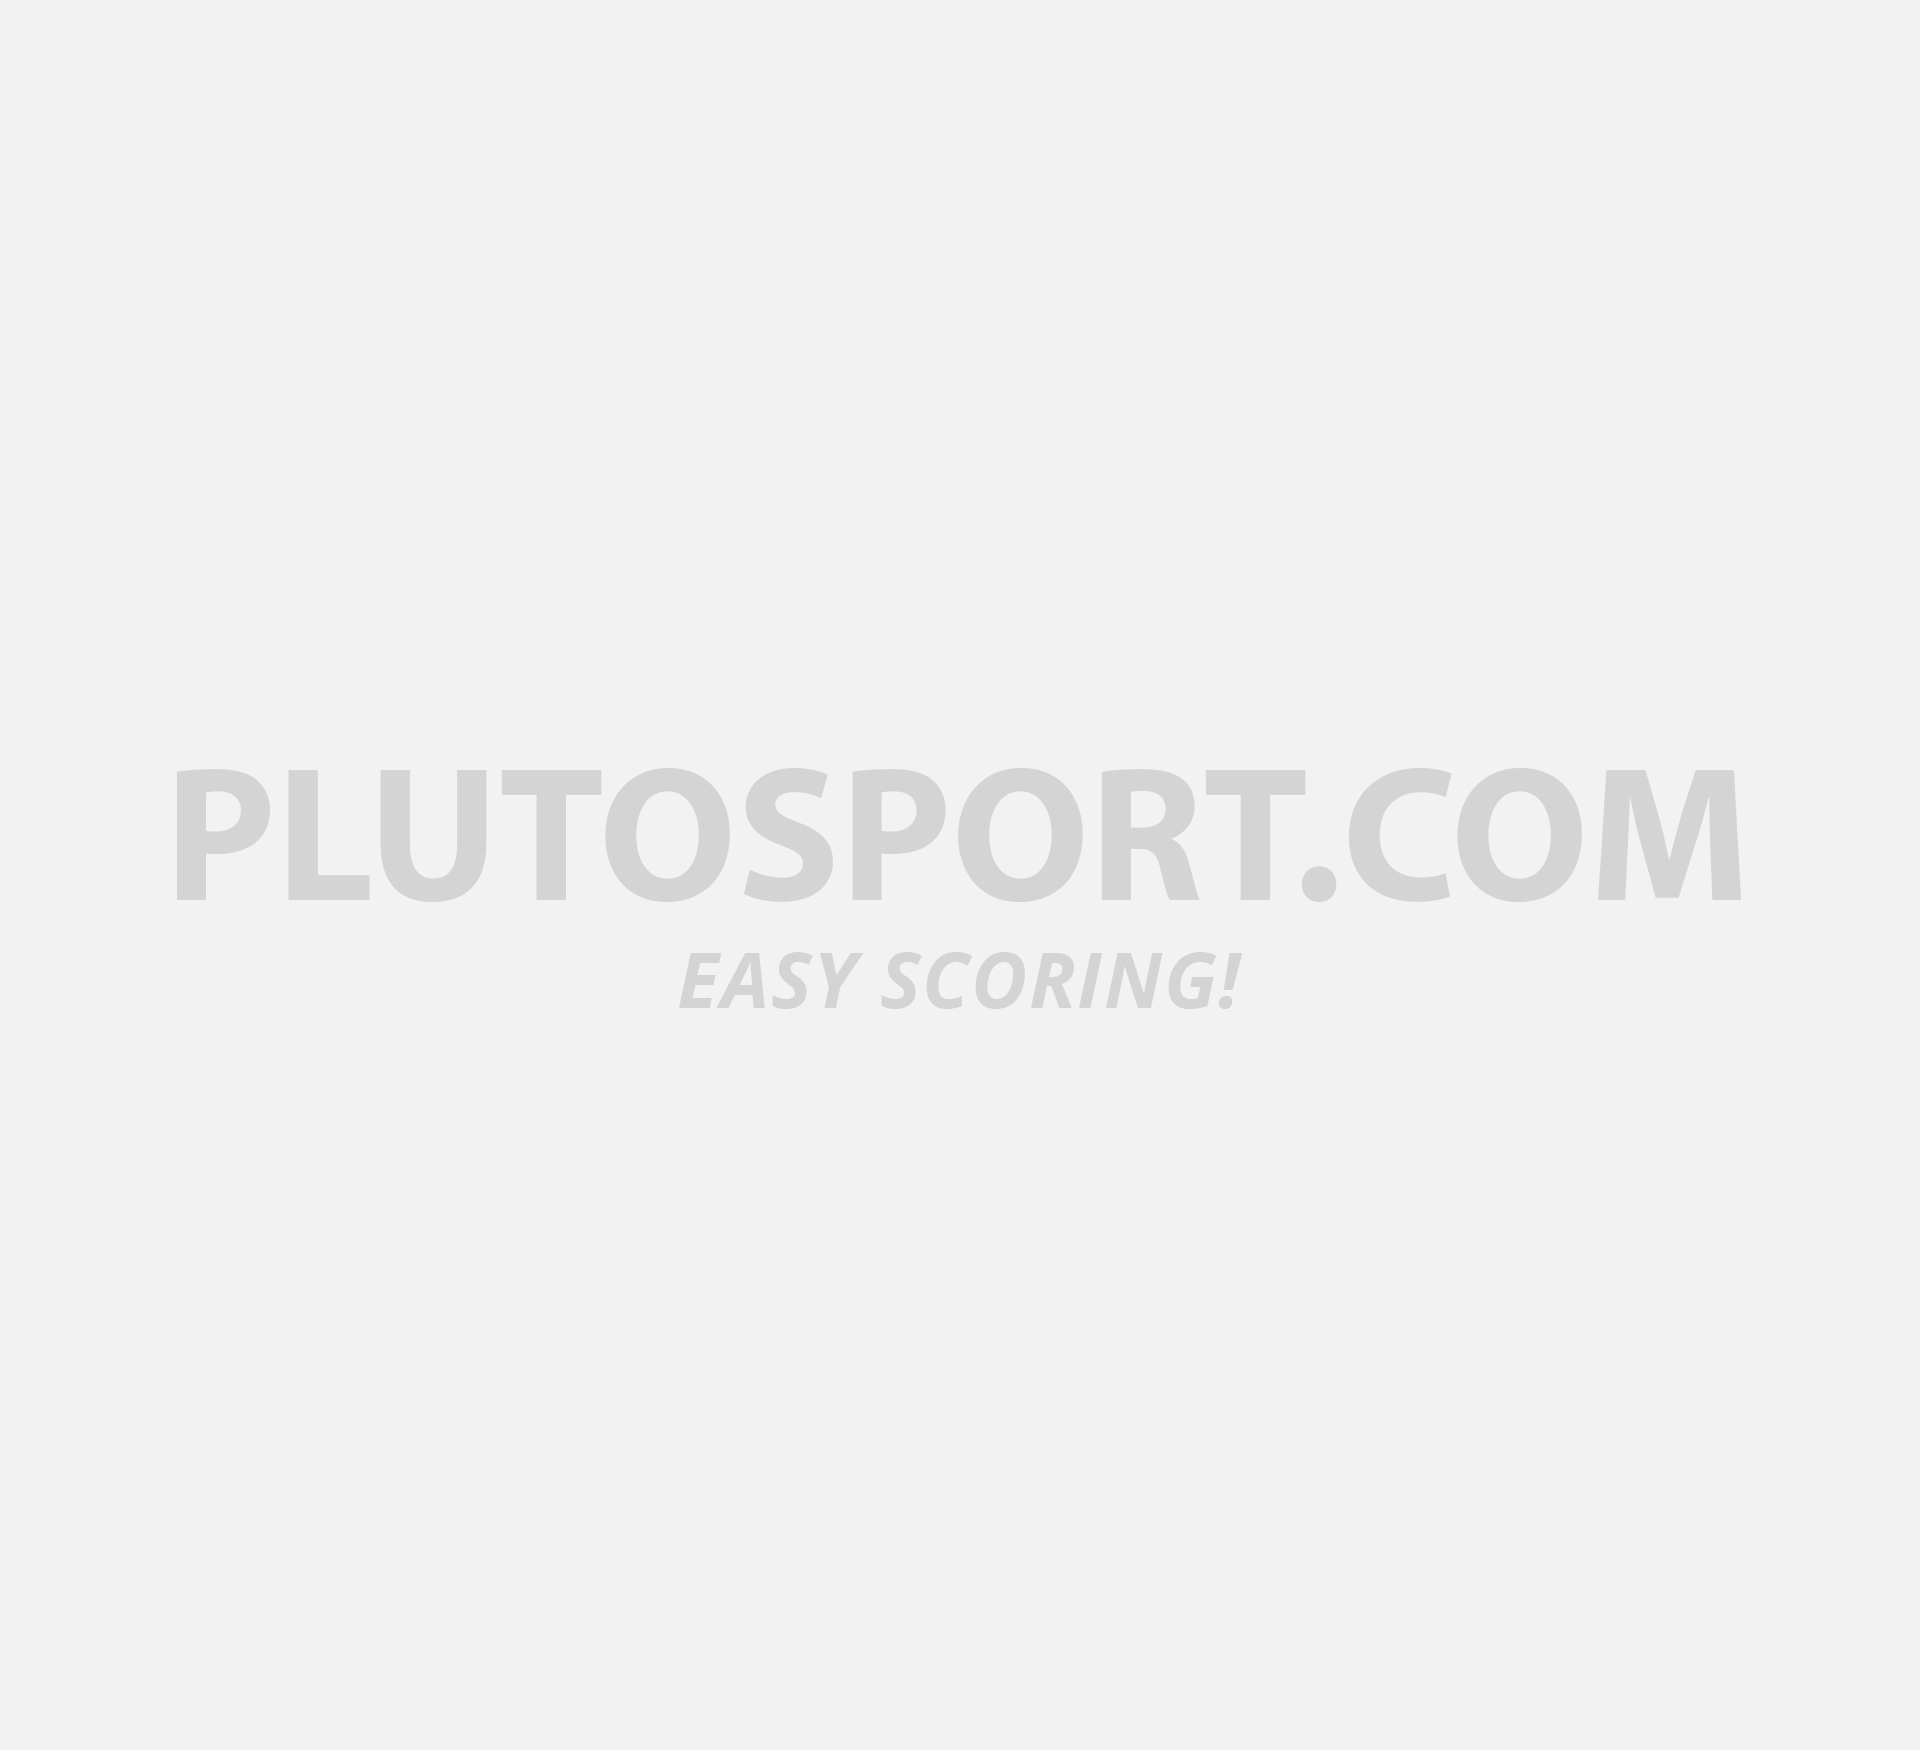 3ee1b7f5443 Adidas Adilette Slippers Senior - Bath slippers - Slippers - Shoes -  Lifestyle - Sports